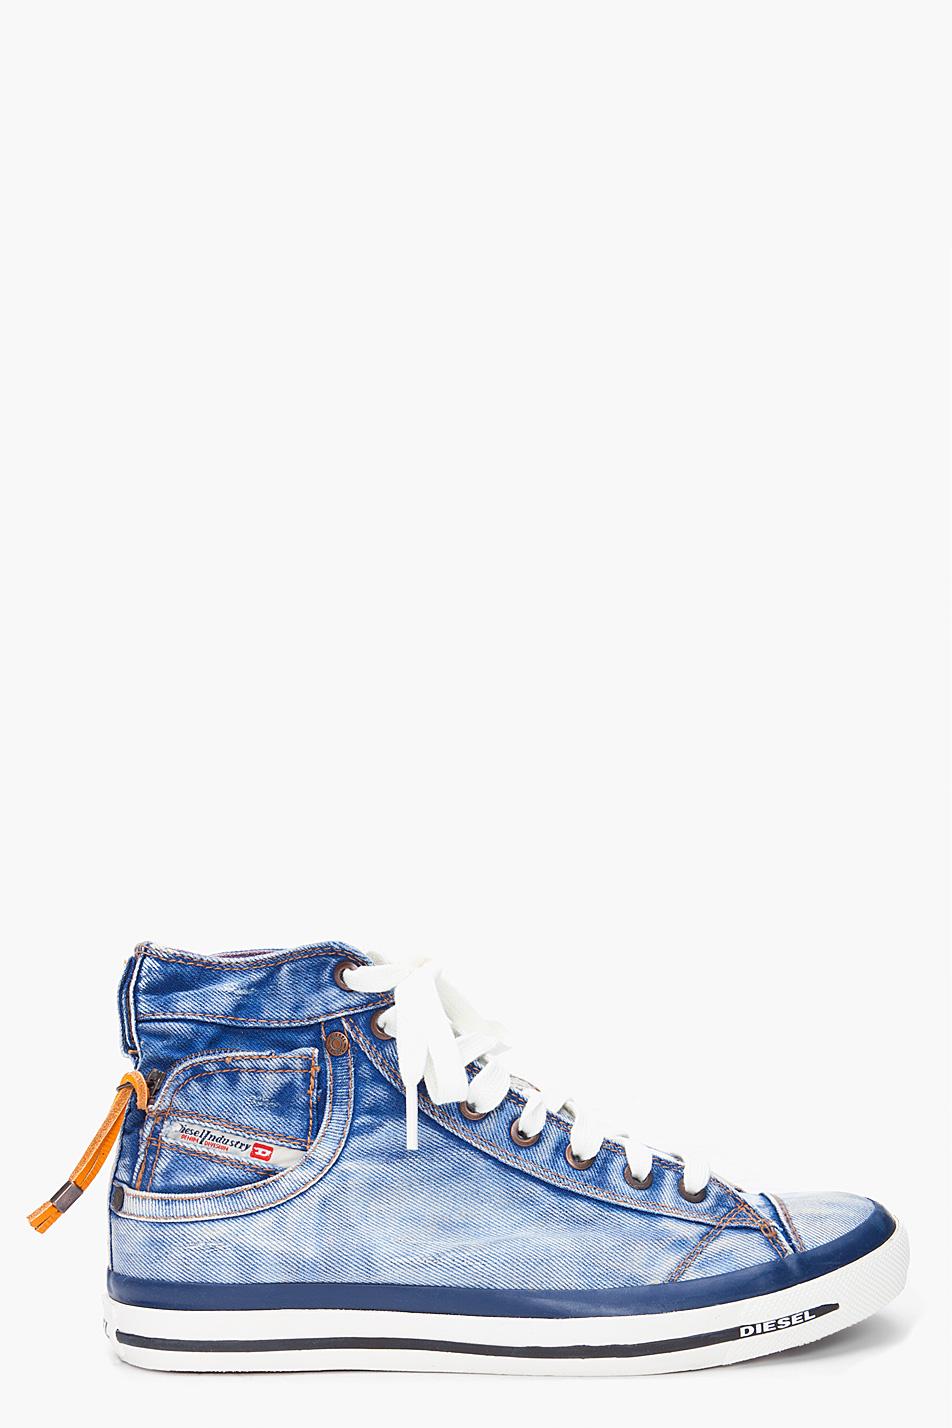 Lyst Diesel High Denim Expoiak Sneakers In Blue For Men